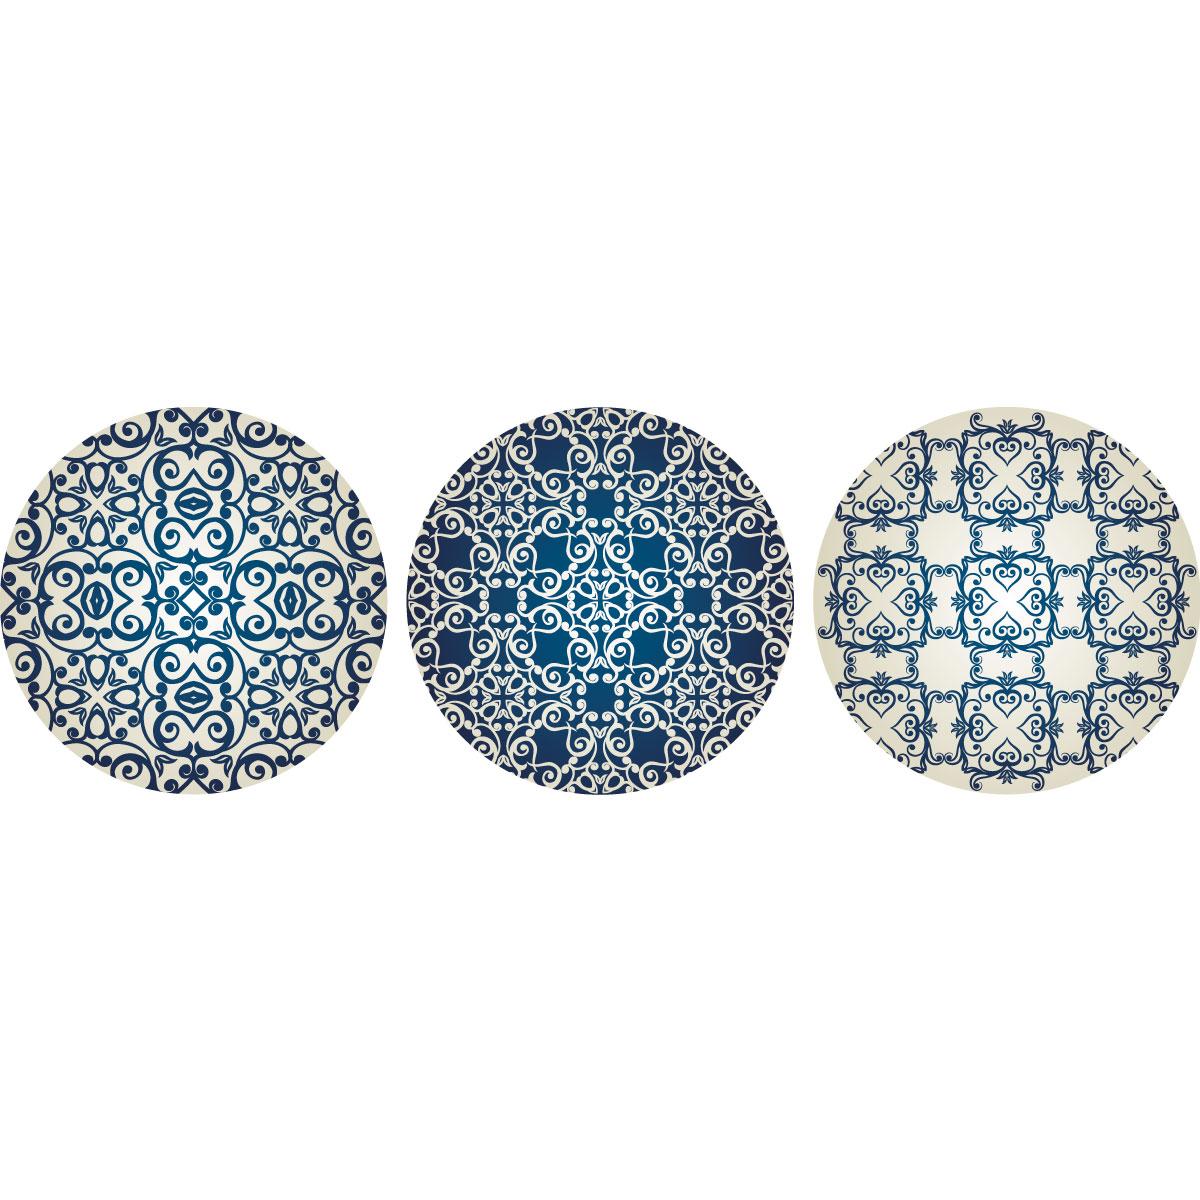 sticker 3 ronds d233coratifs arabesque bleu et gris